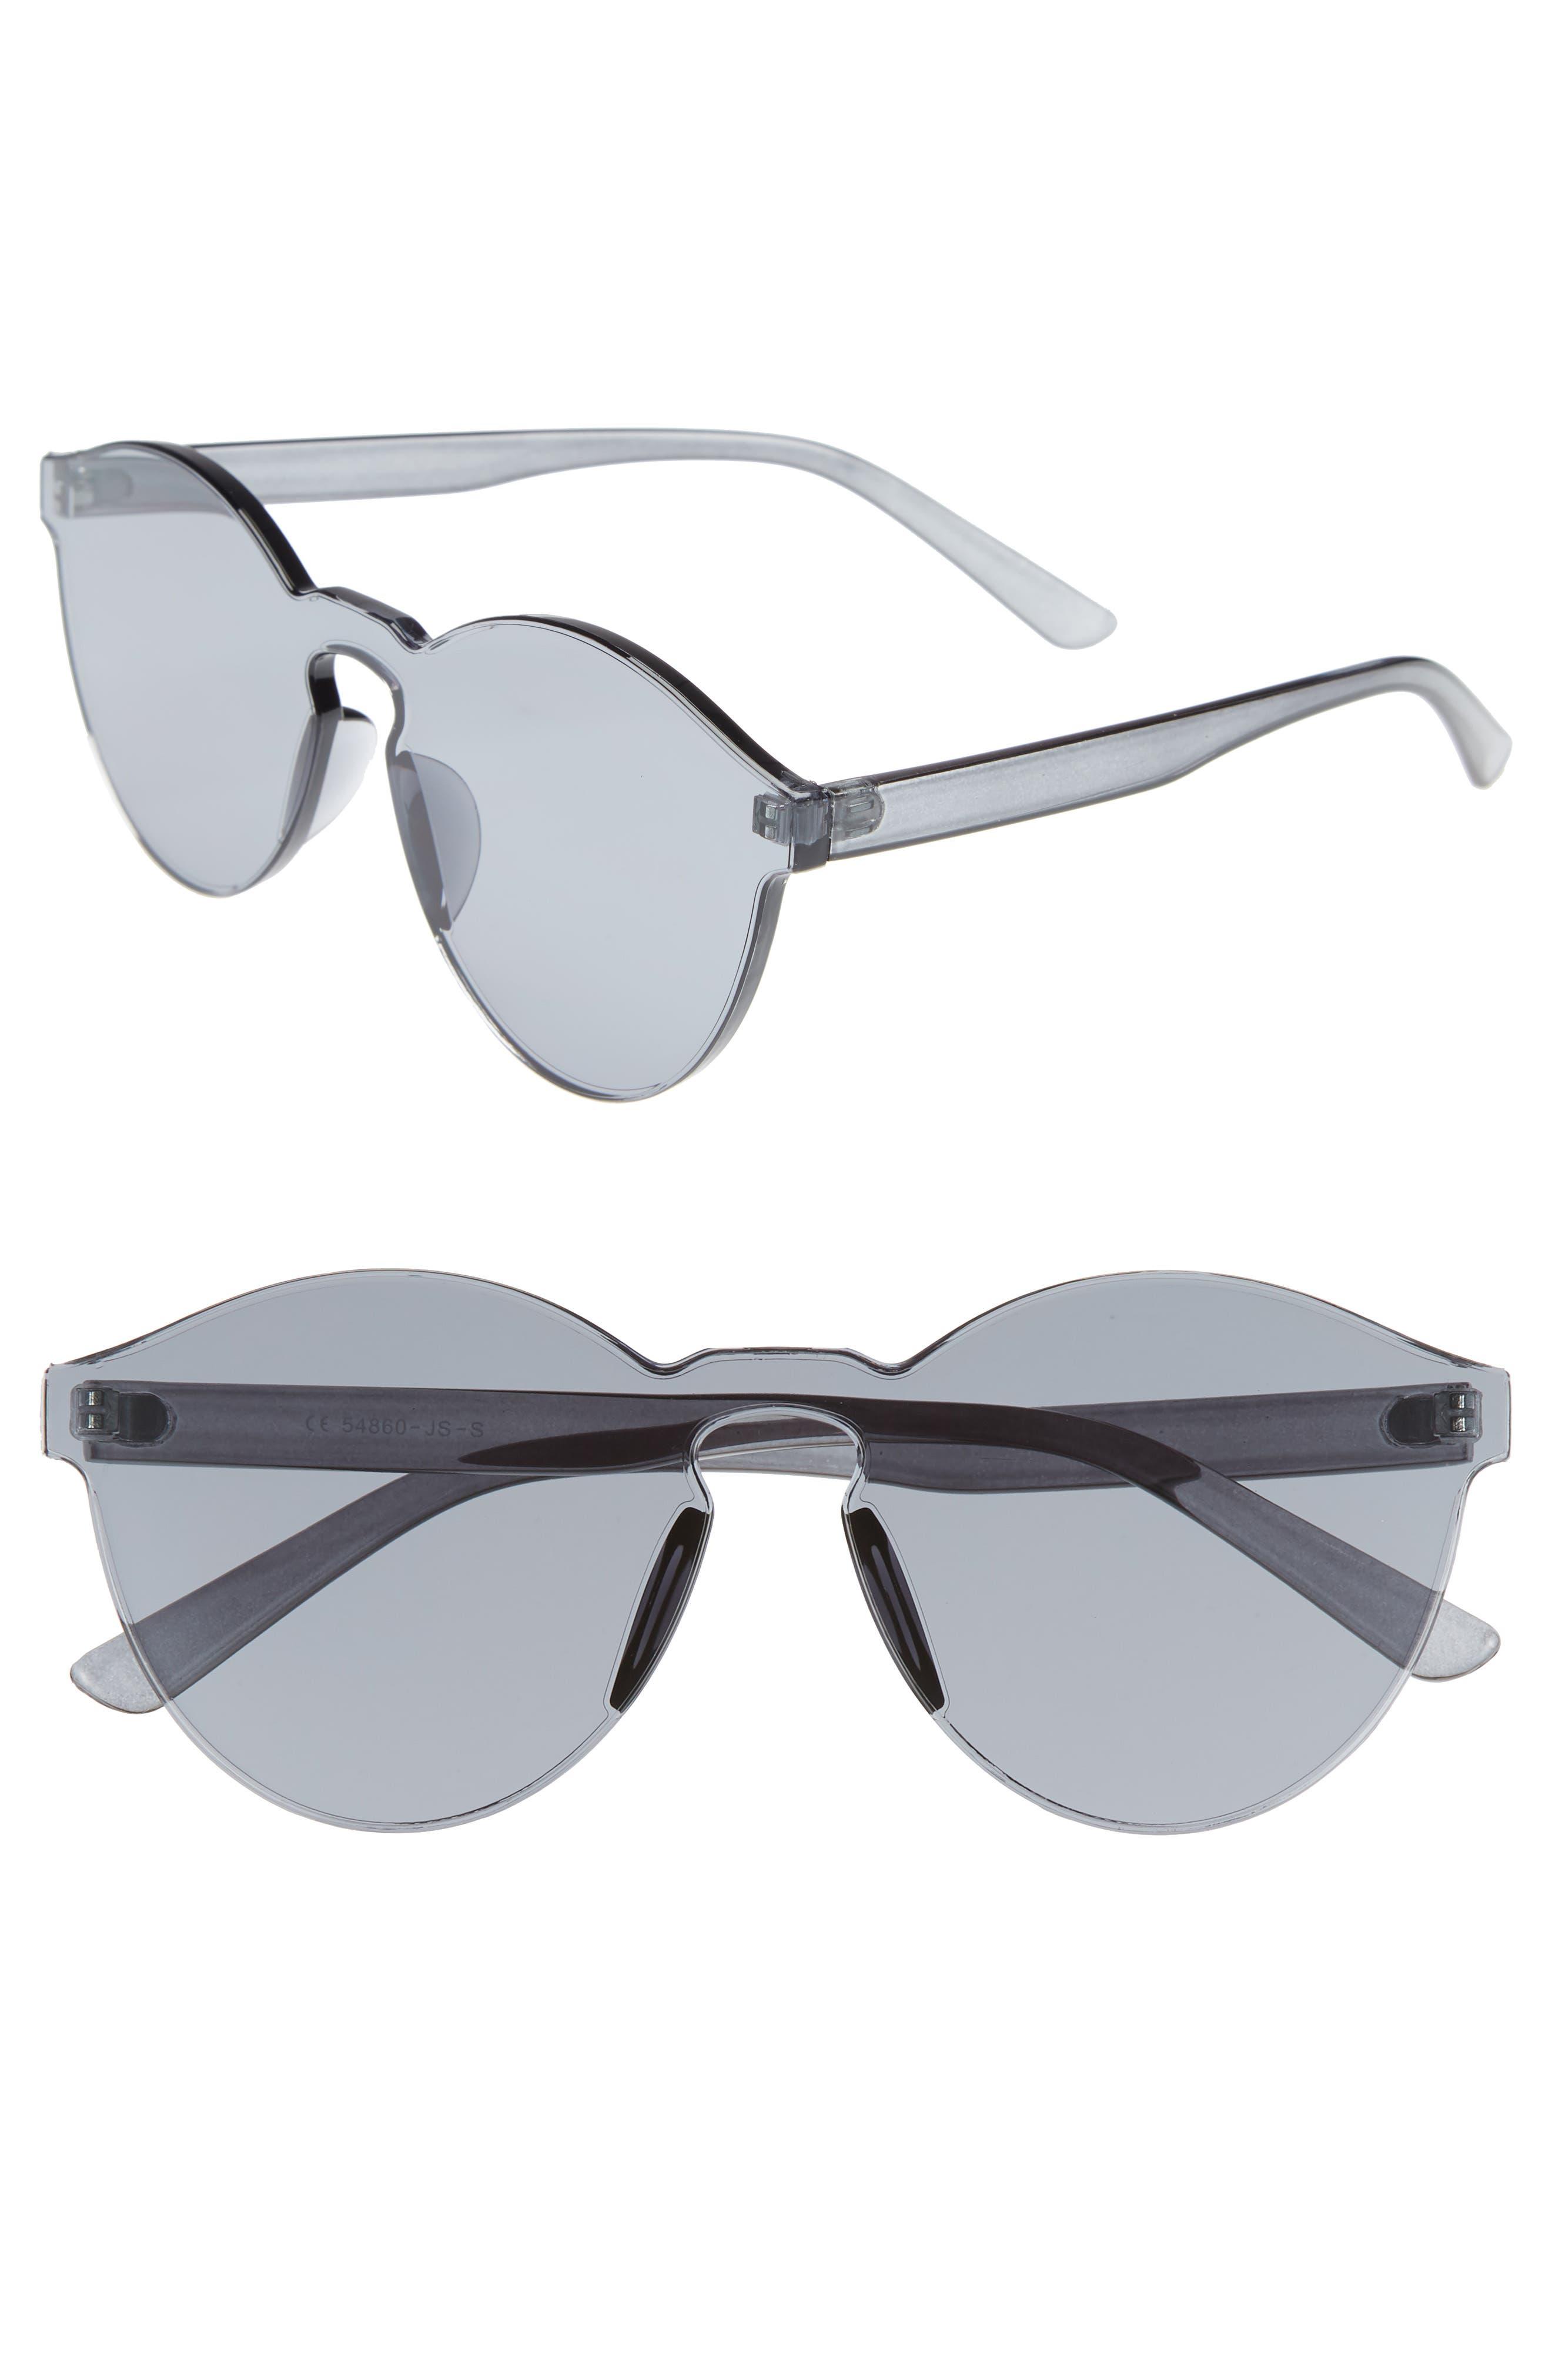 56mm Rimless Round Sunglasses,                             Main thumbnail 1, color,                             Black